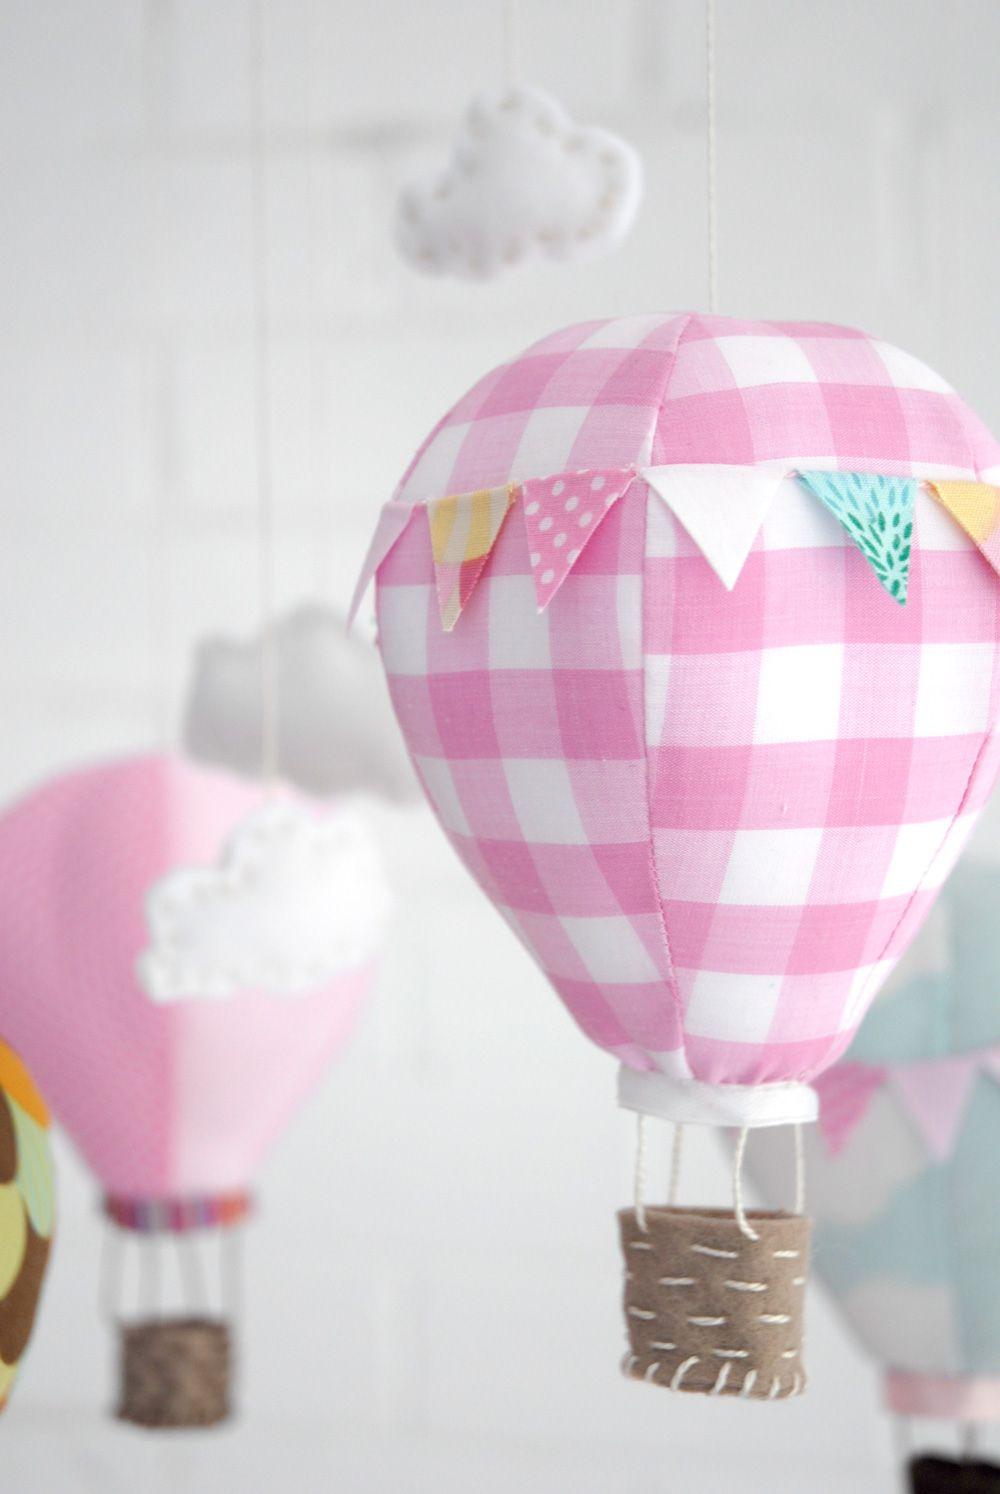 Heißluftballon mobile | Heißluftballon Mobile | Pinterest ...